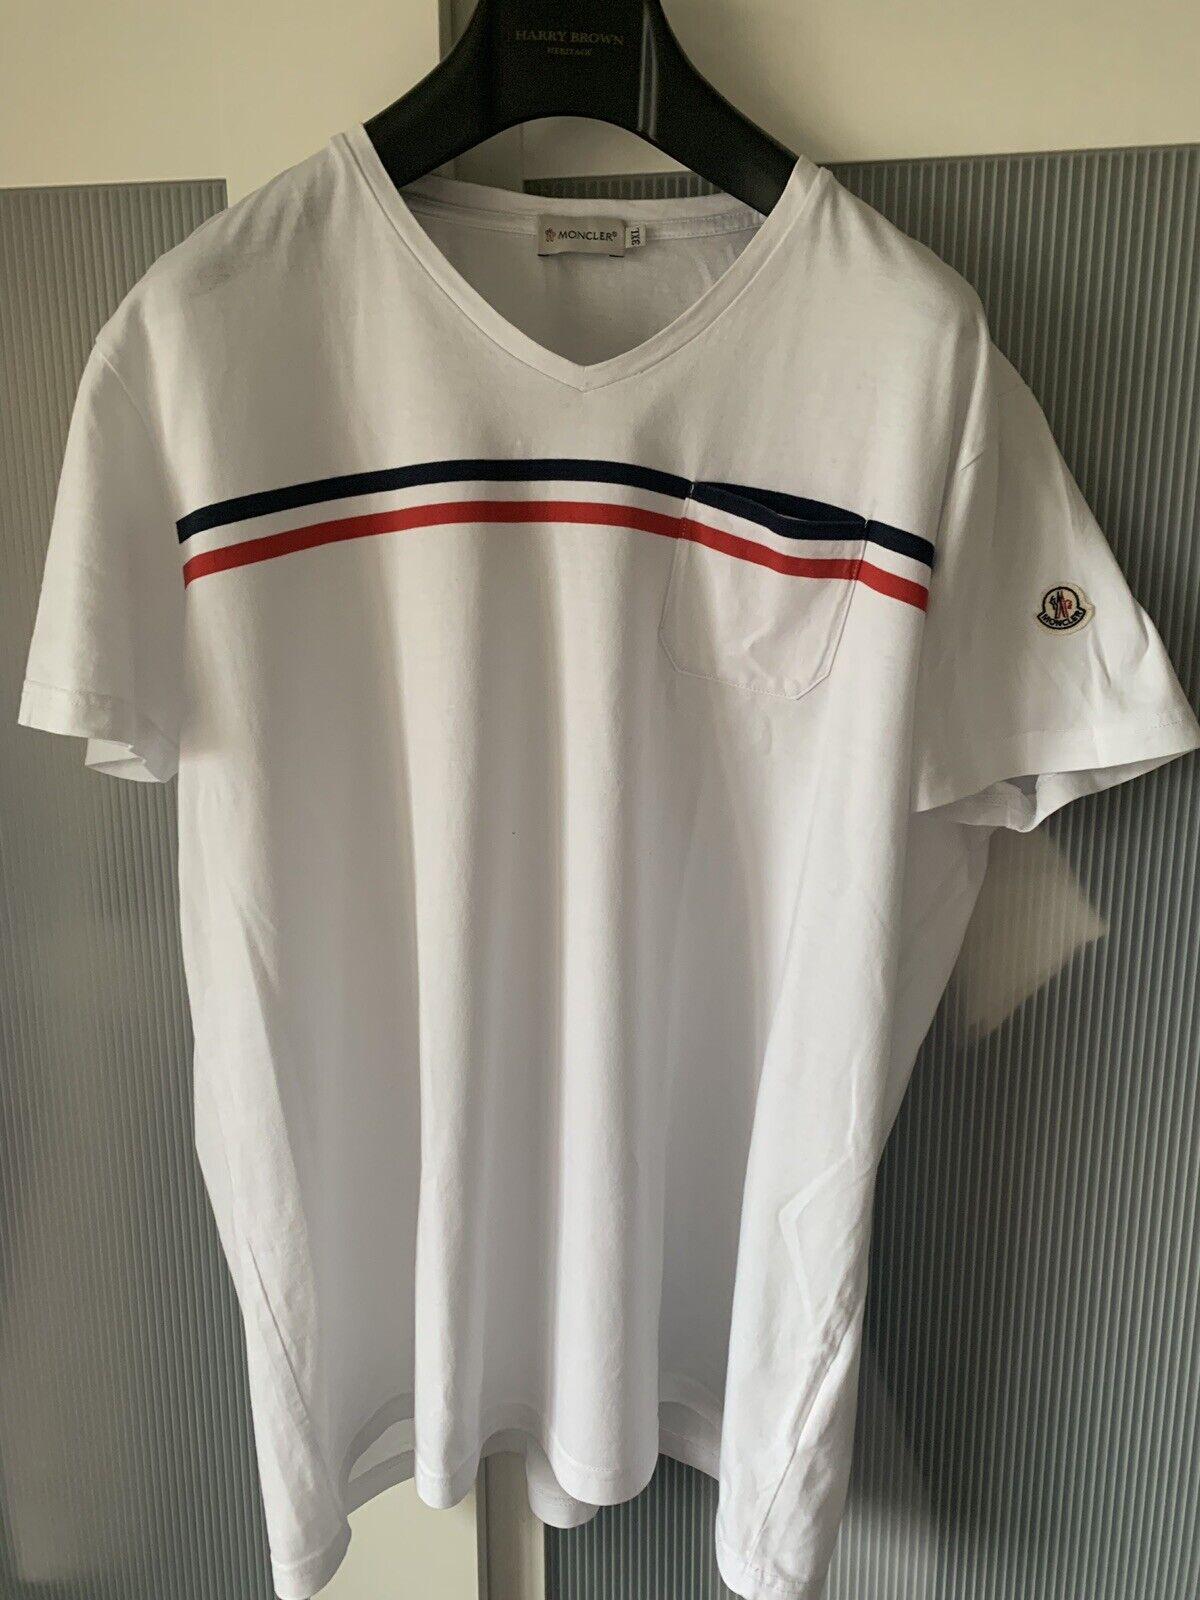 Moncler men short sleeve tshirt top 100% authentic ultra rare